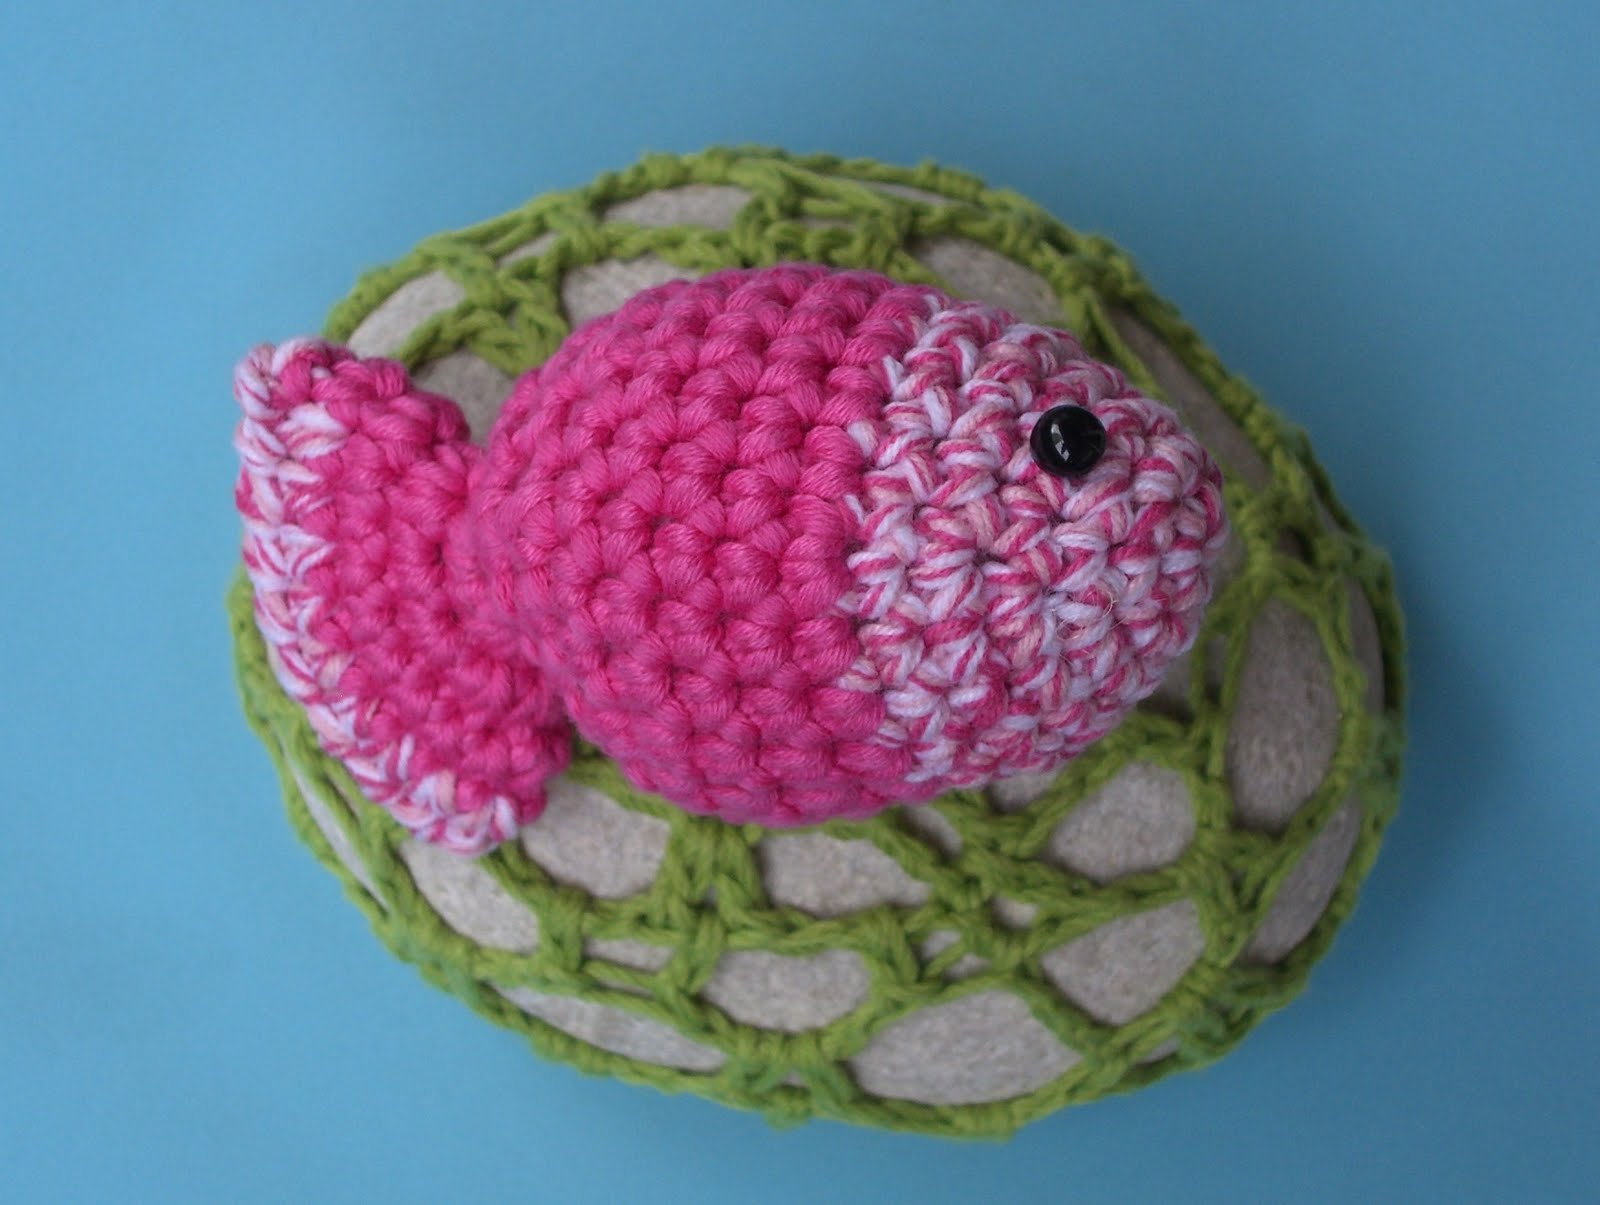 Free Crochet Patterns Of Fish : Free crochet patterns: Fish Family ~ Craft , handmade blog